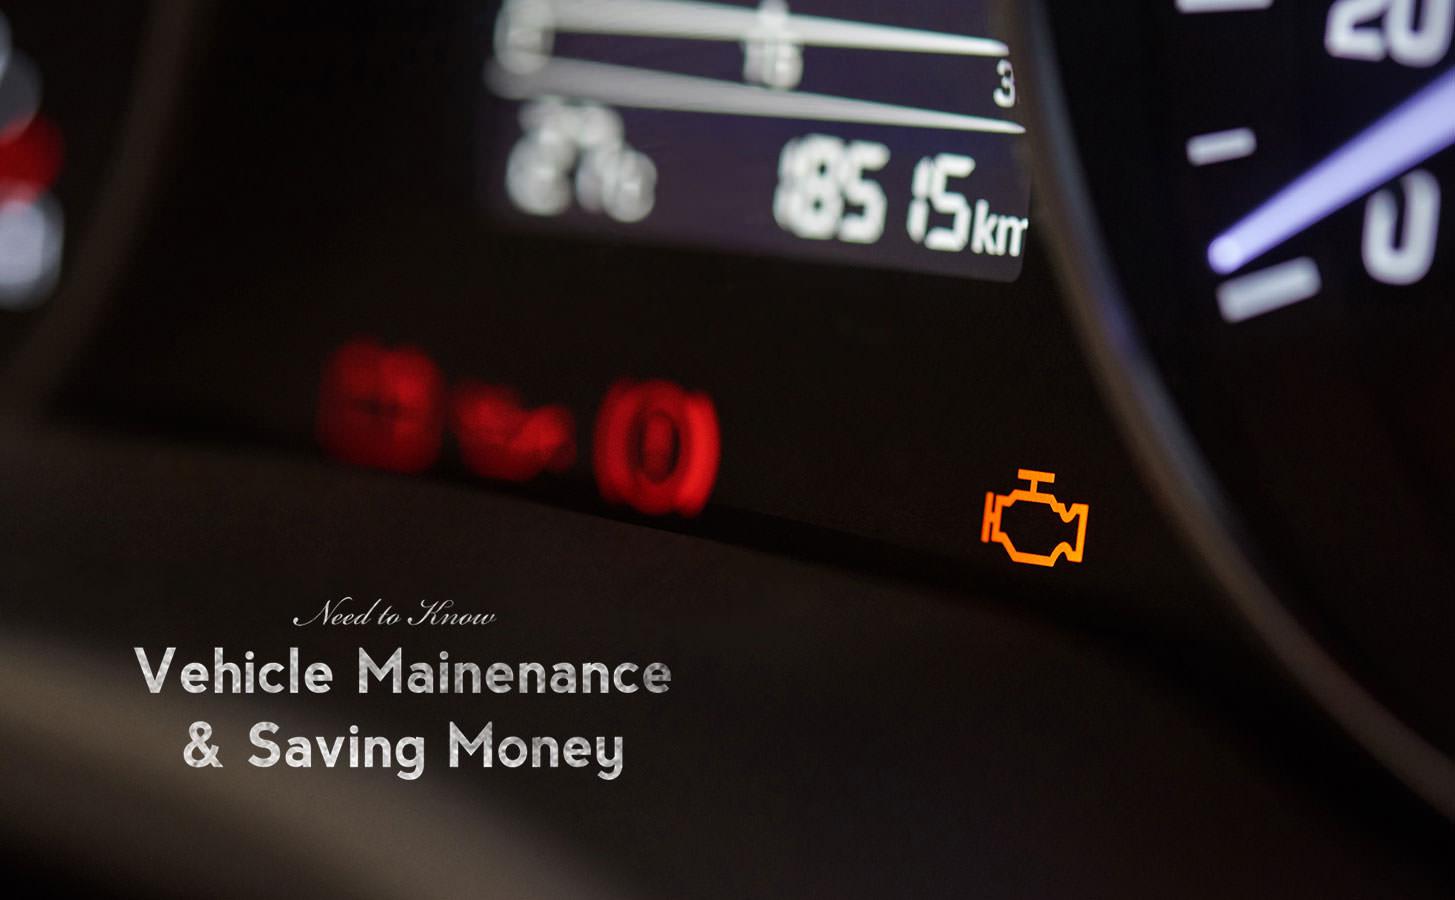 Vehicle Maintenance & Saving Money